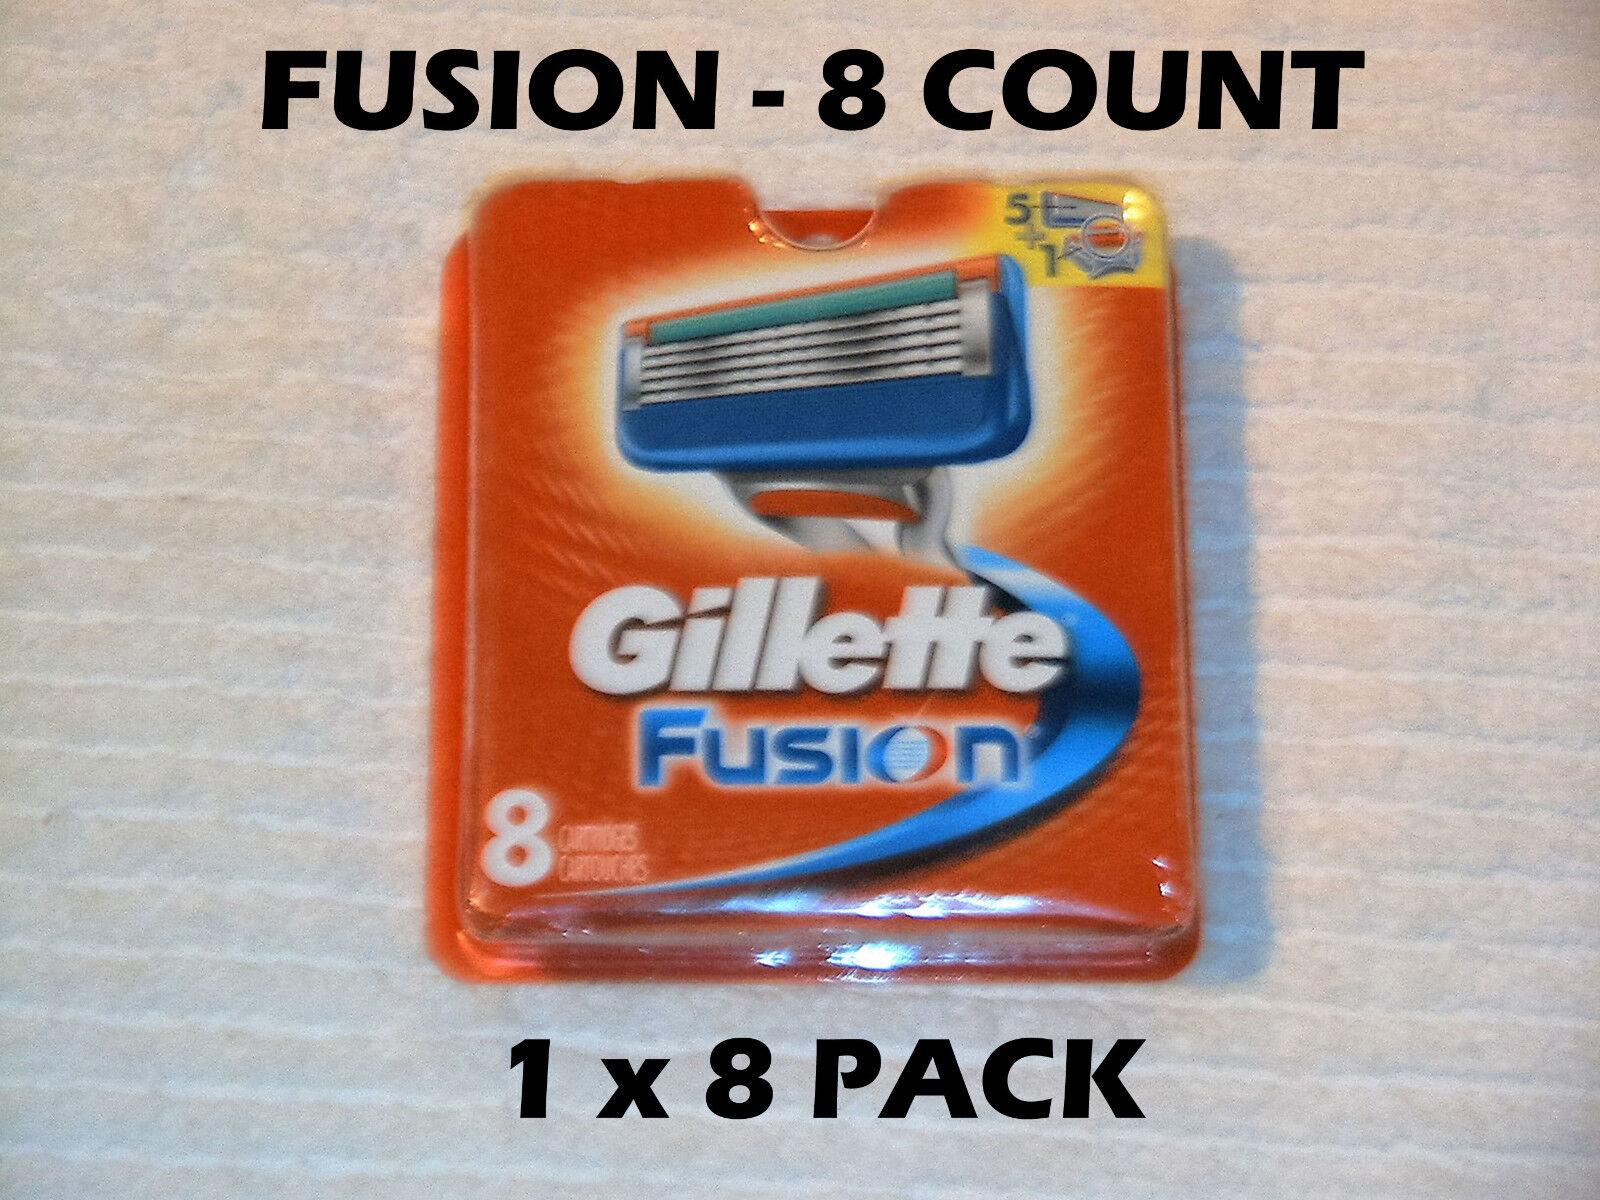 Gillette Fusion - 8 Count (1 X 8 Packs)